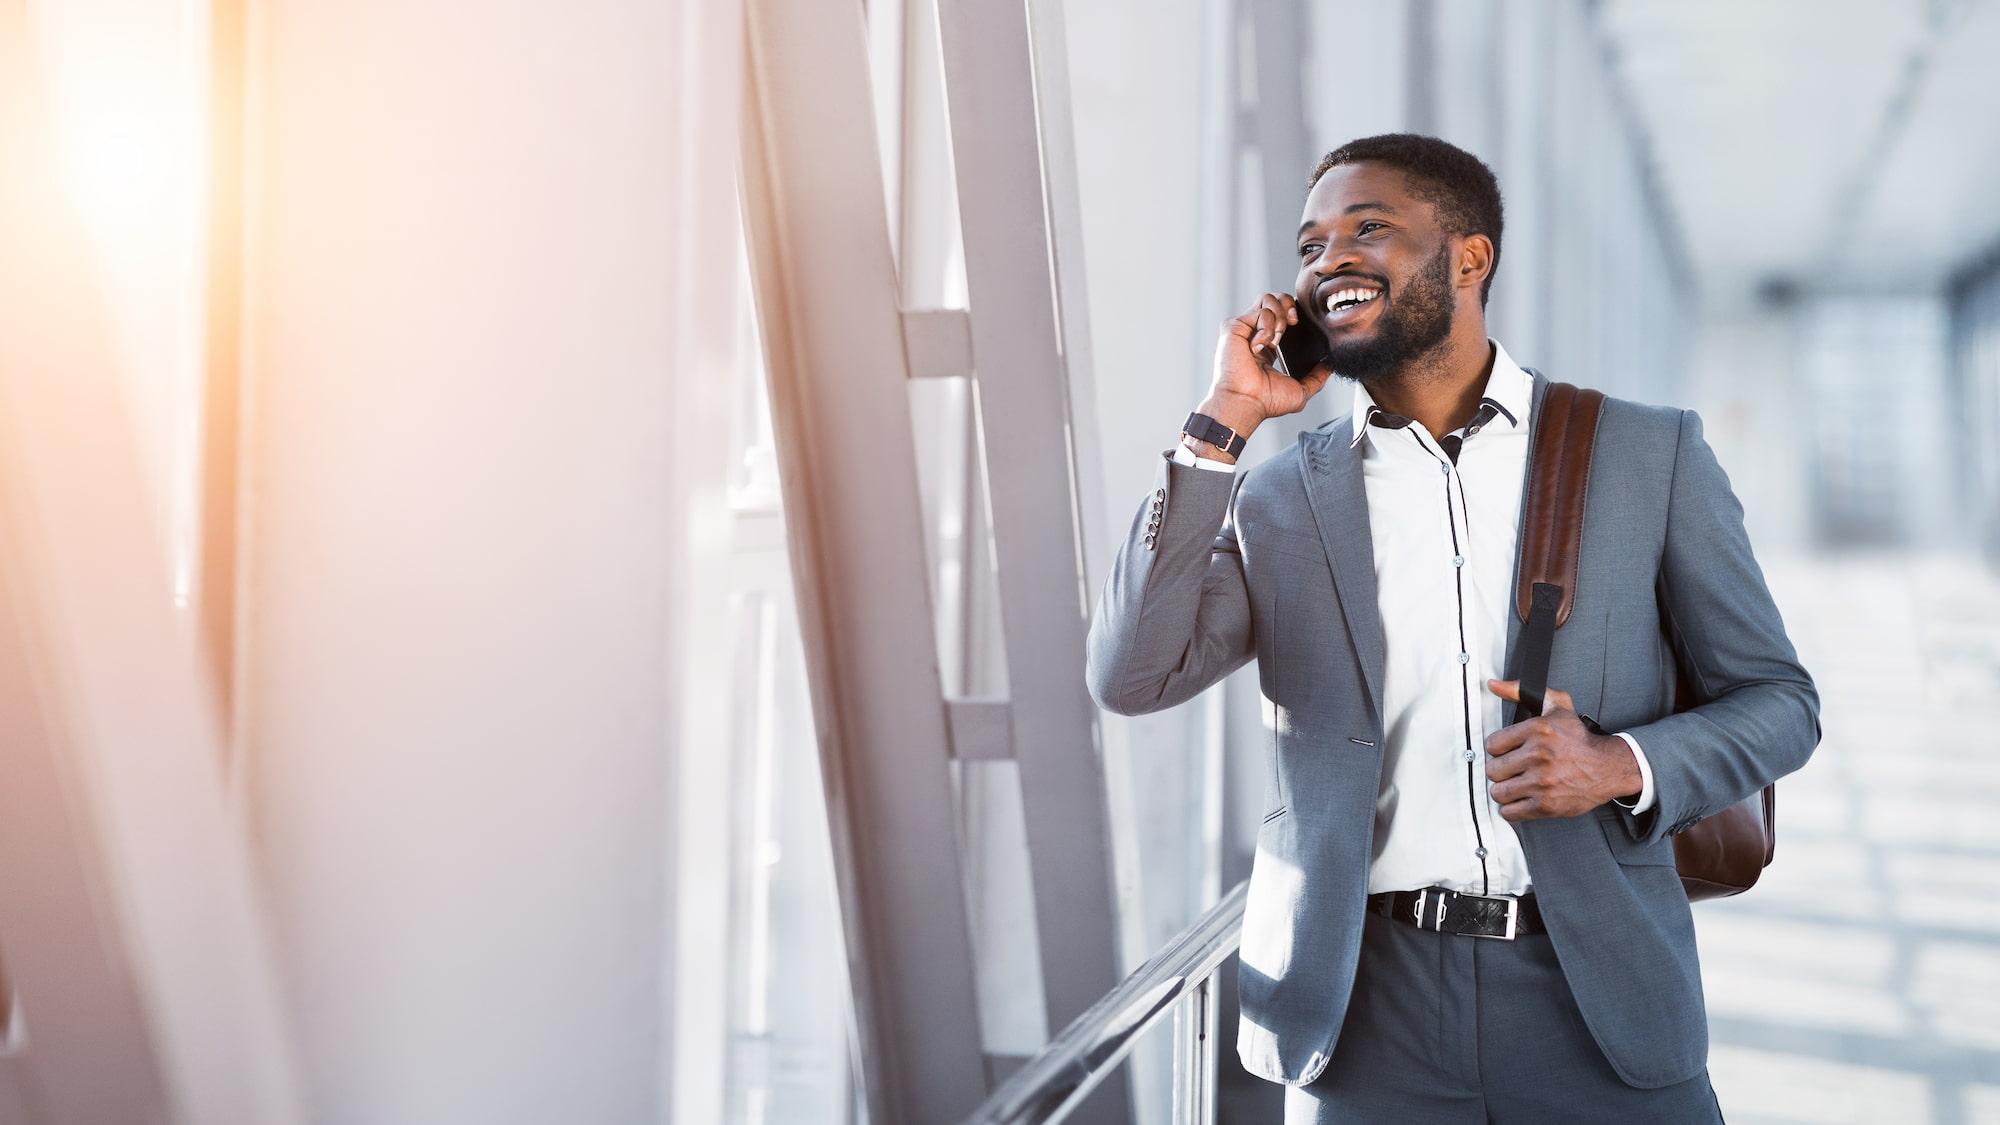 African American businessman on phone